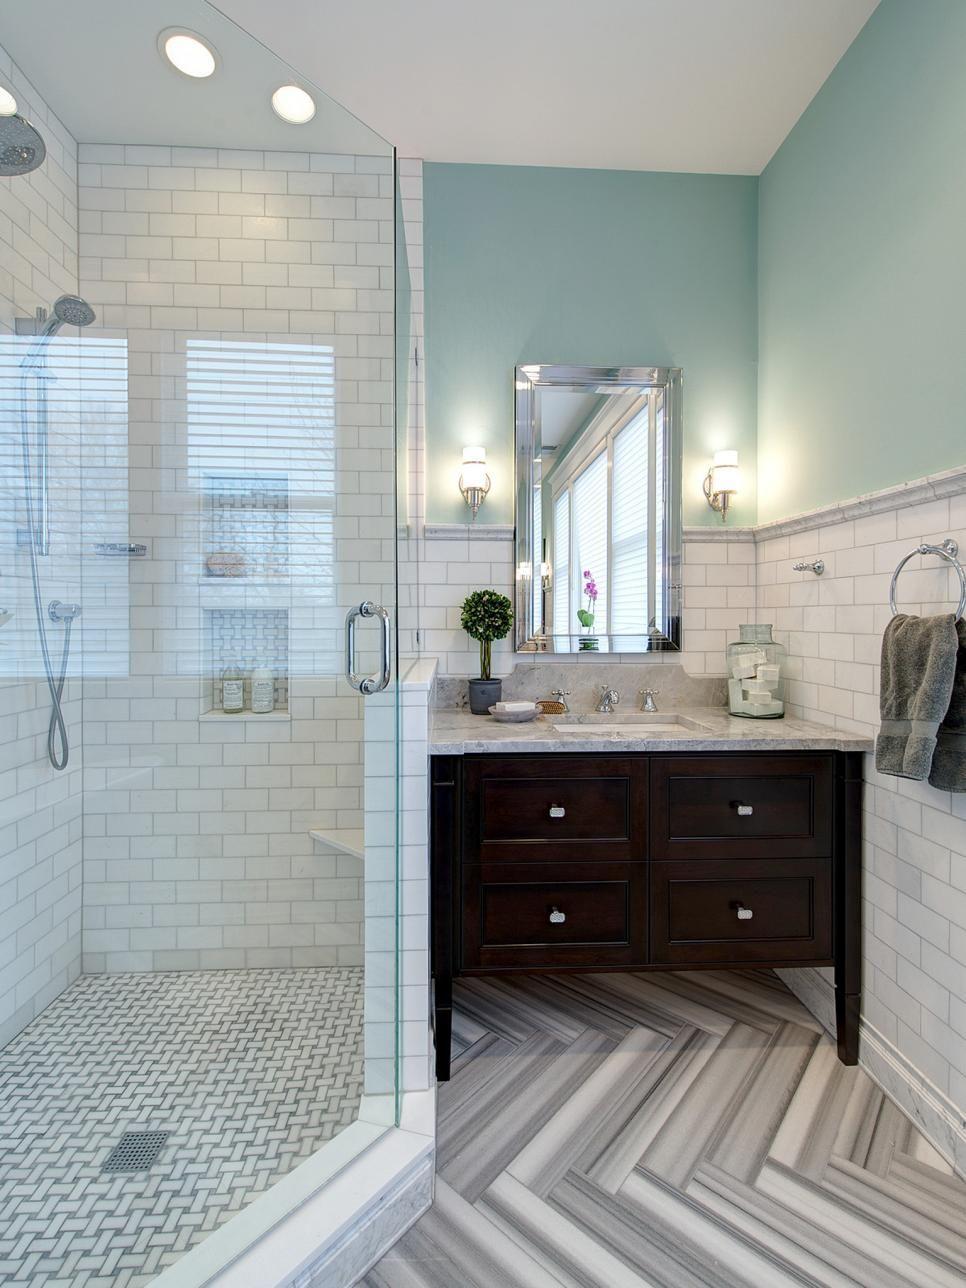 Bathroom designs Bathroom Gets Elegant Eclectic Remodel